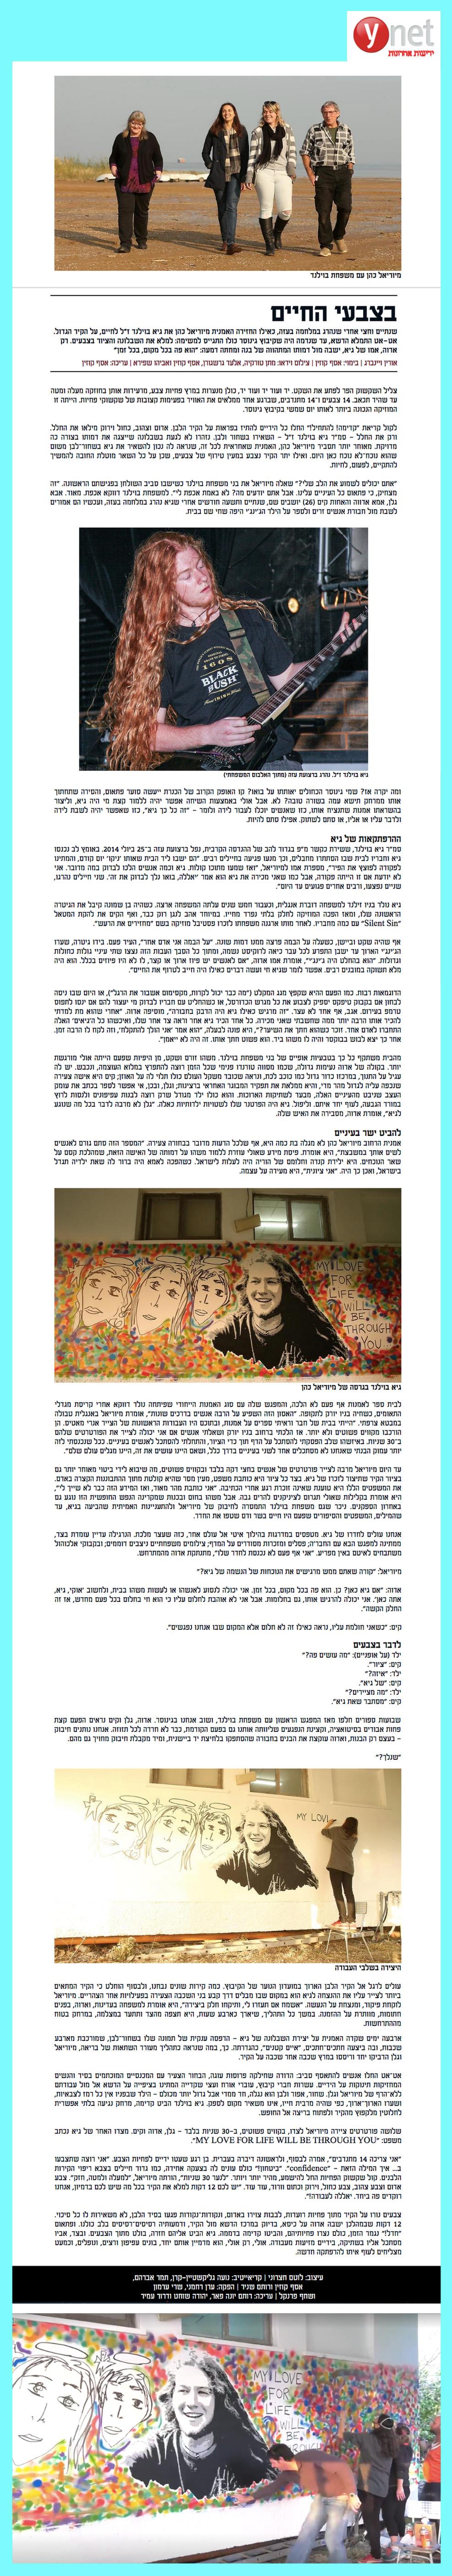 Ynet Memorial 2017 2.jpg